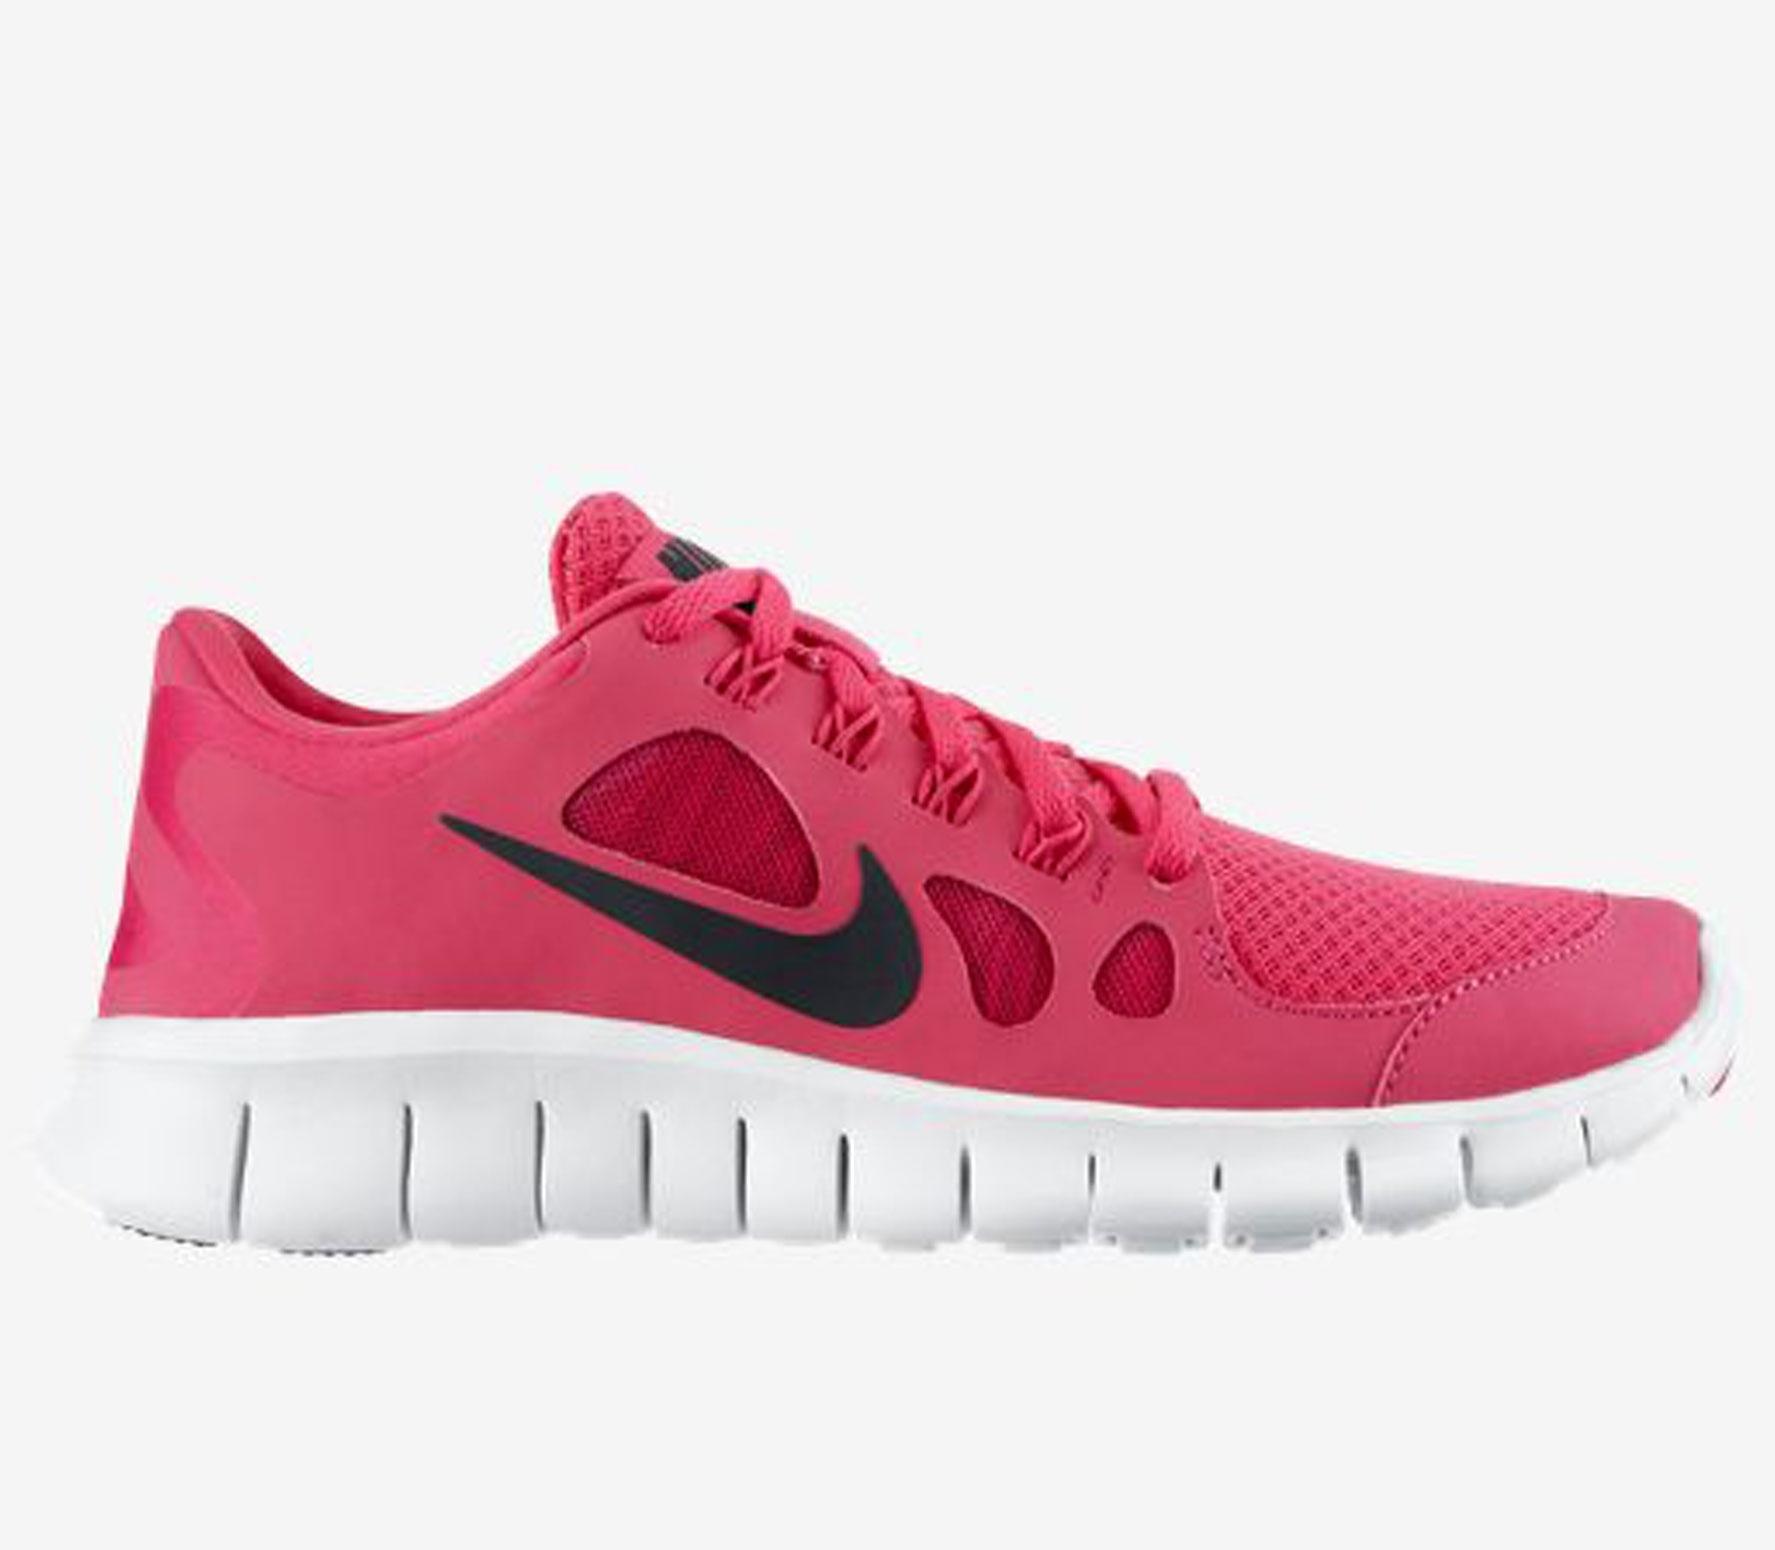 e05875207b95 Nike Lunarglide 5 Heel Toe Drop